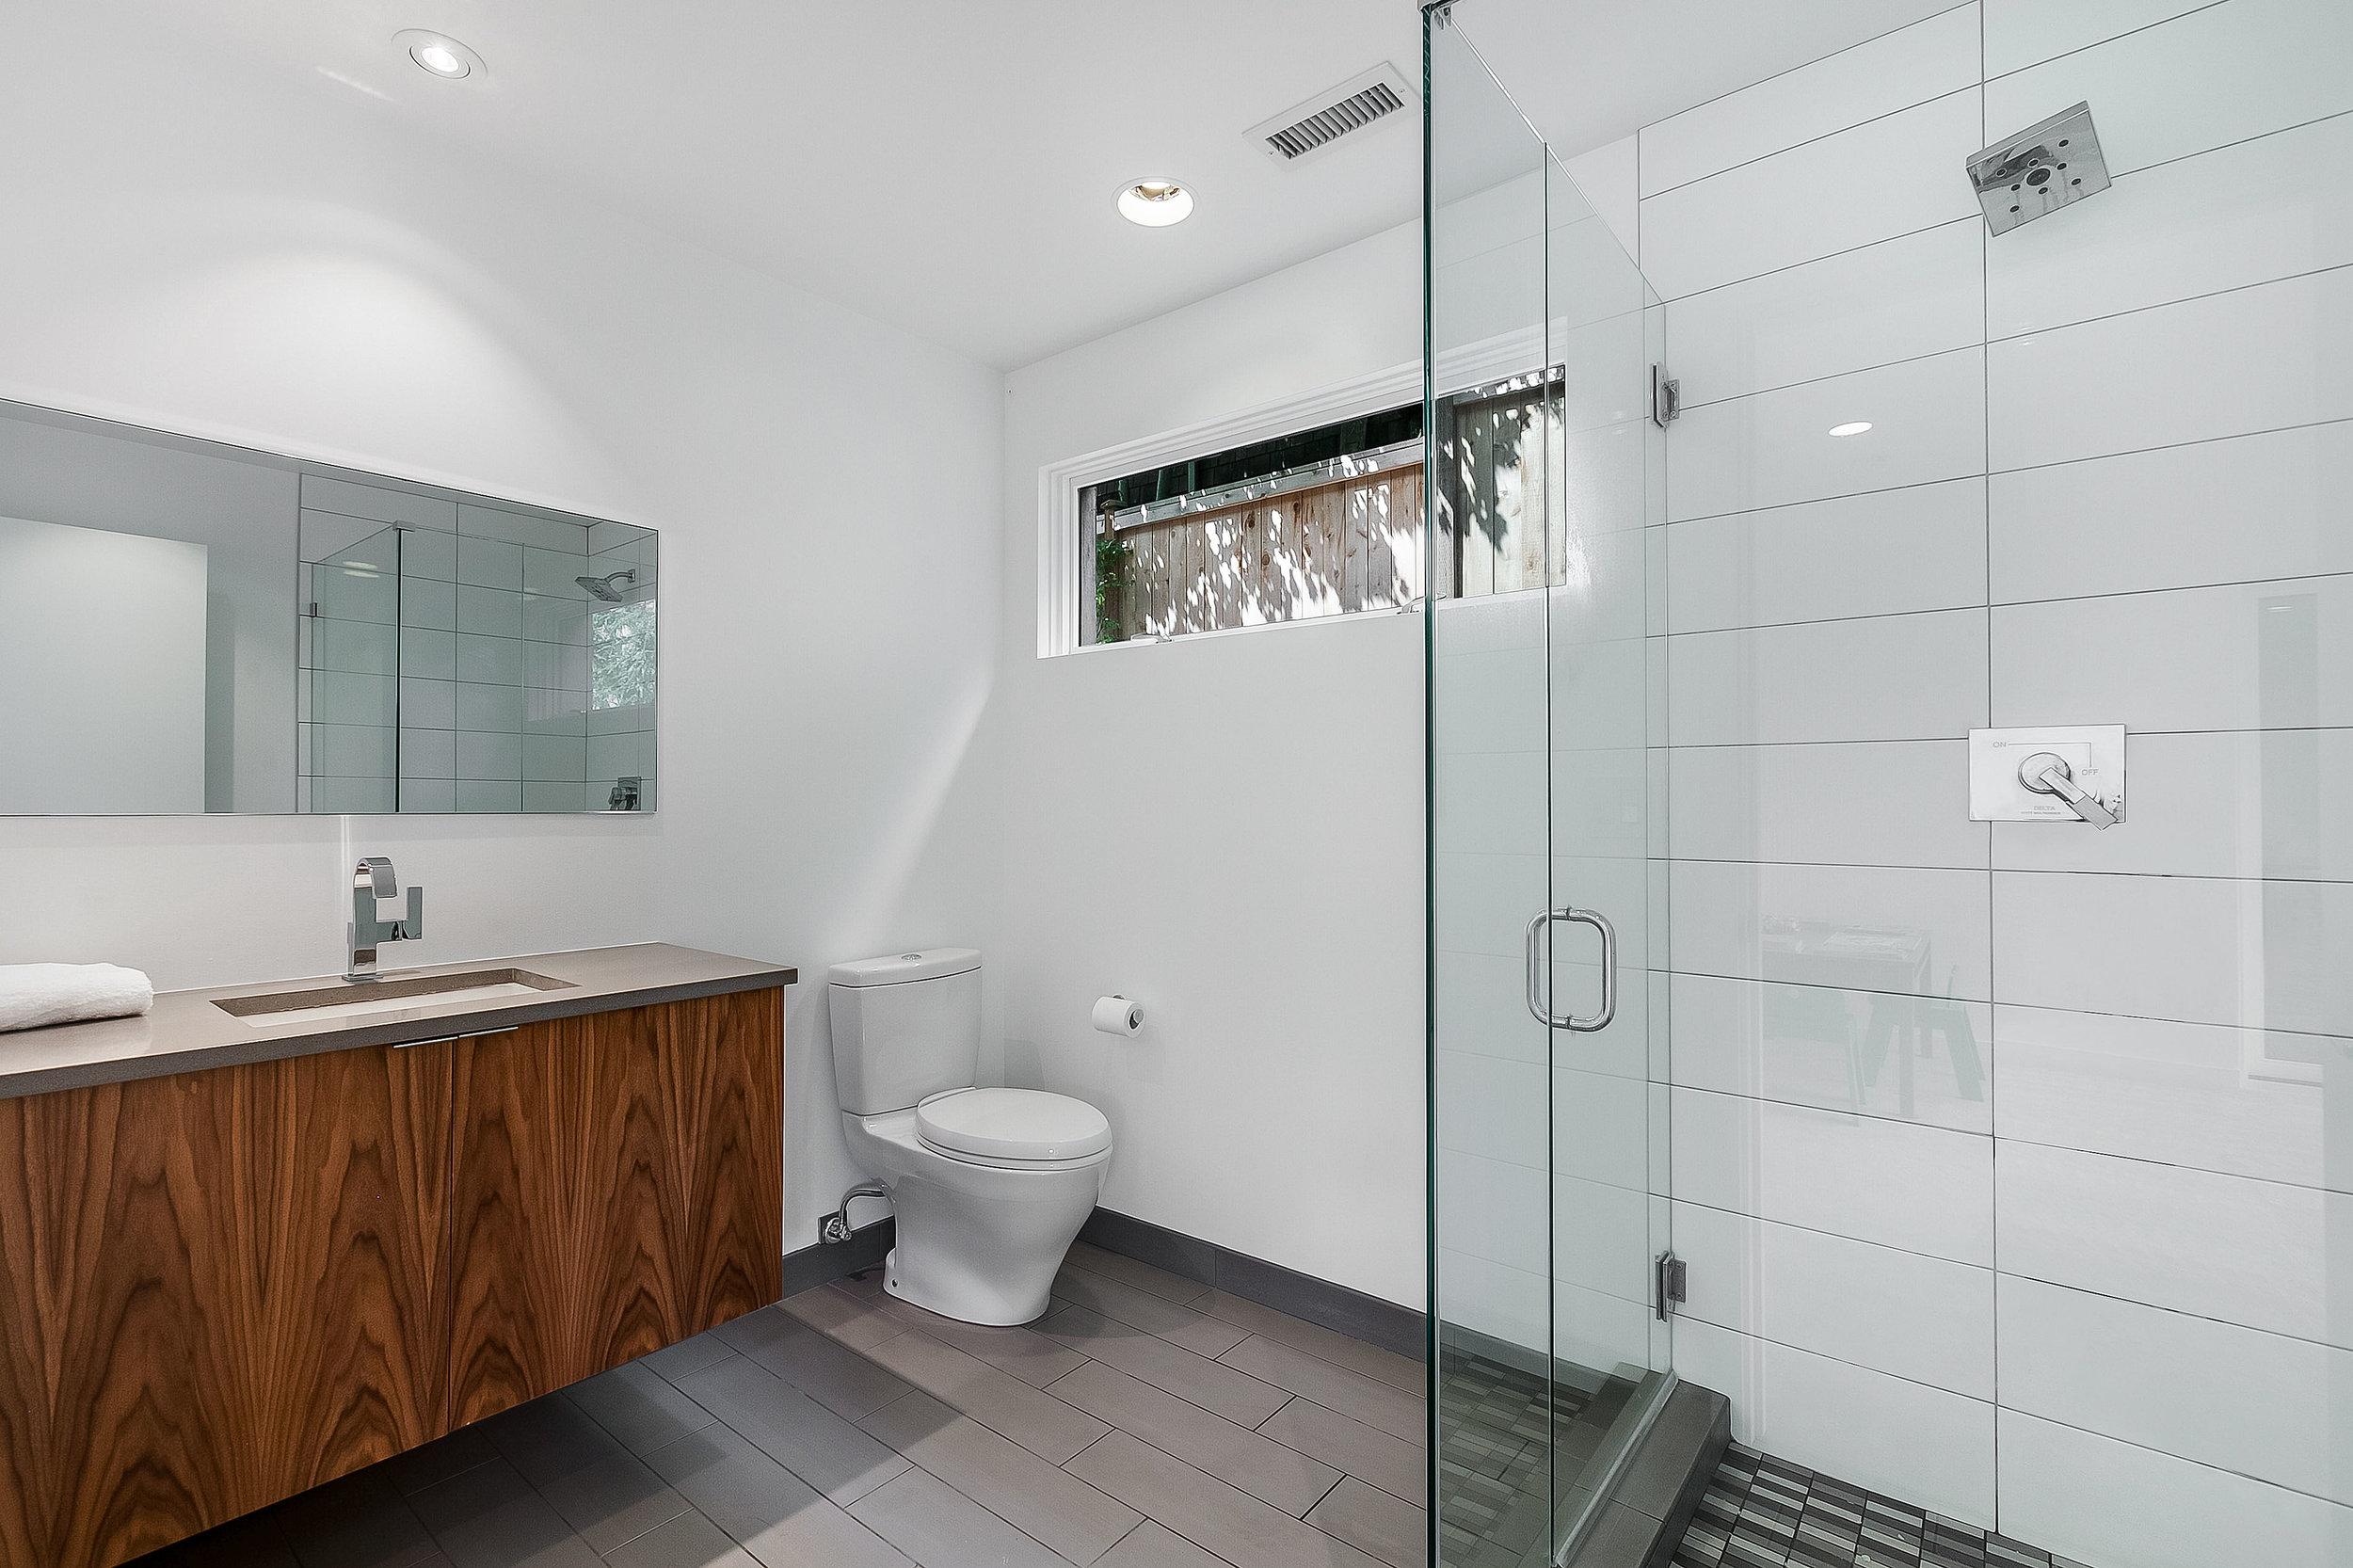 modern_bathroom_new_white_tile_architect_architecture_design_skie